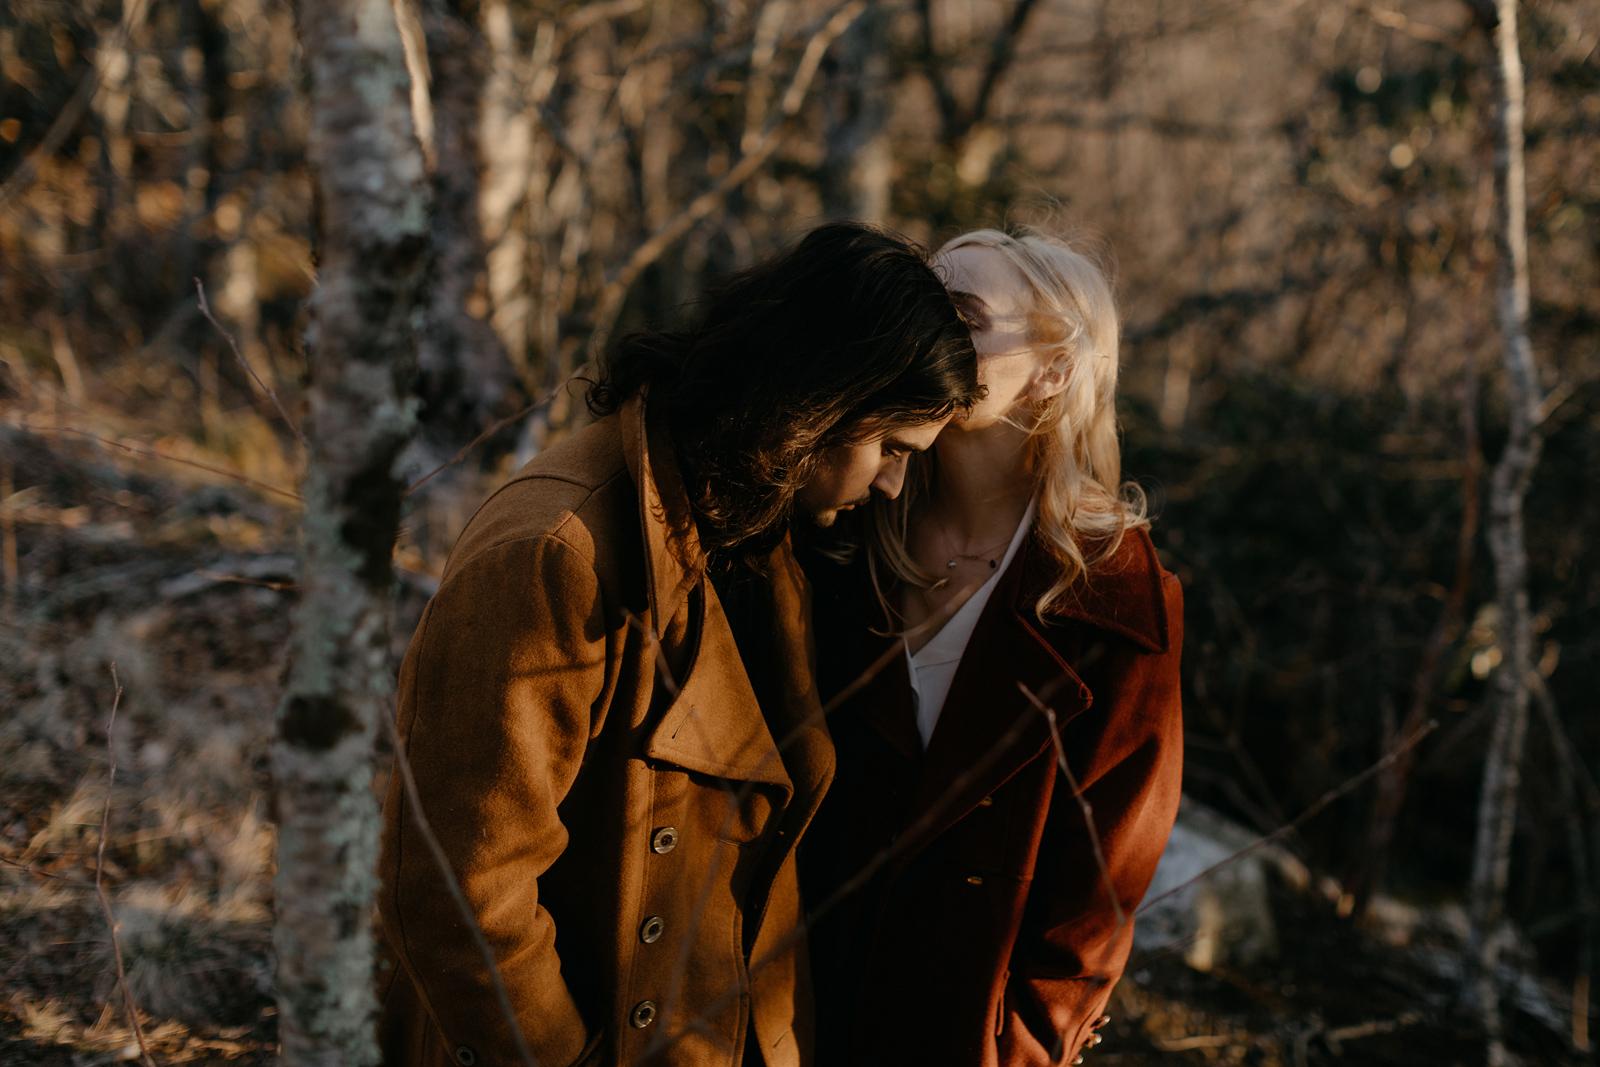 cinematic couples portraits